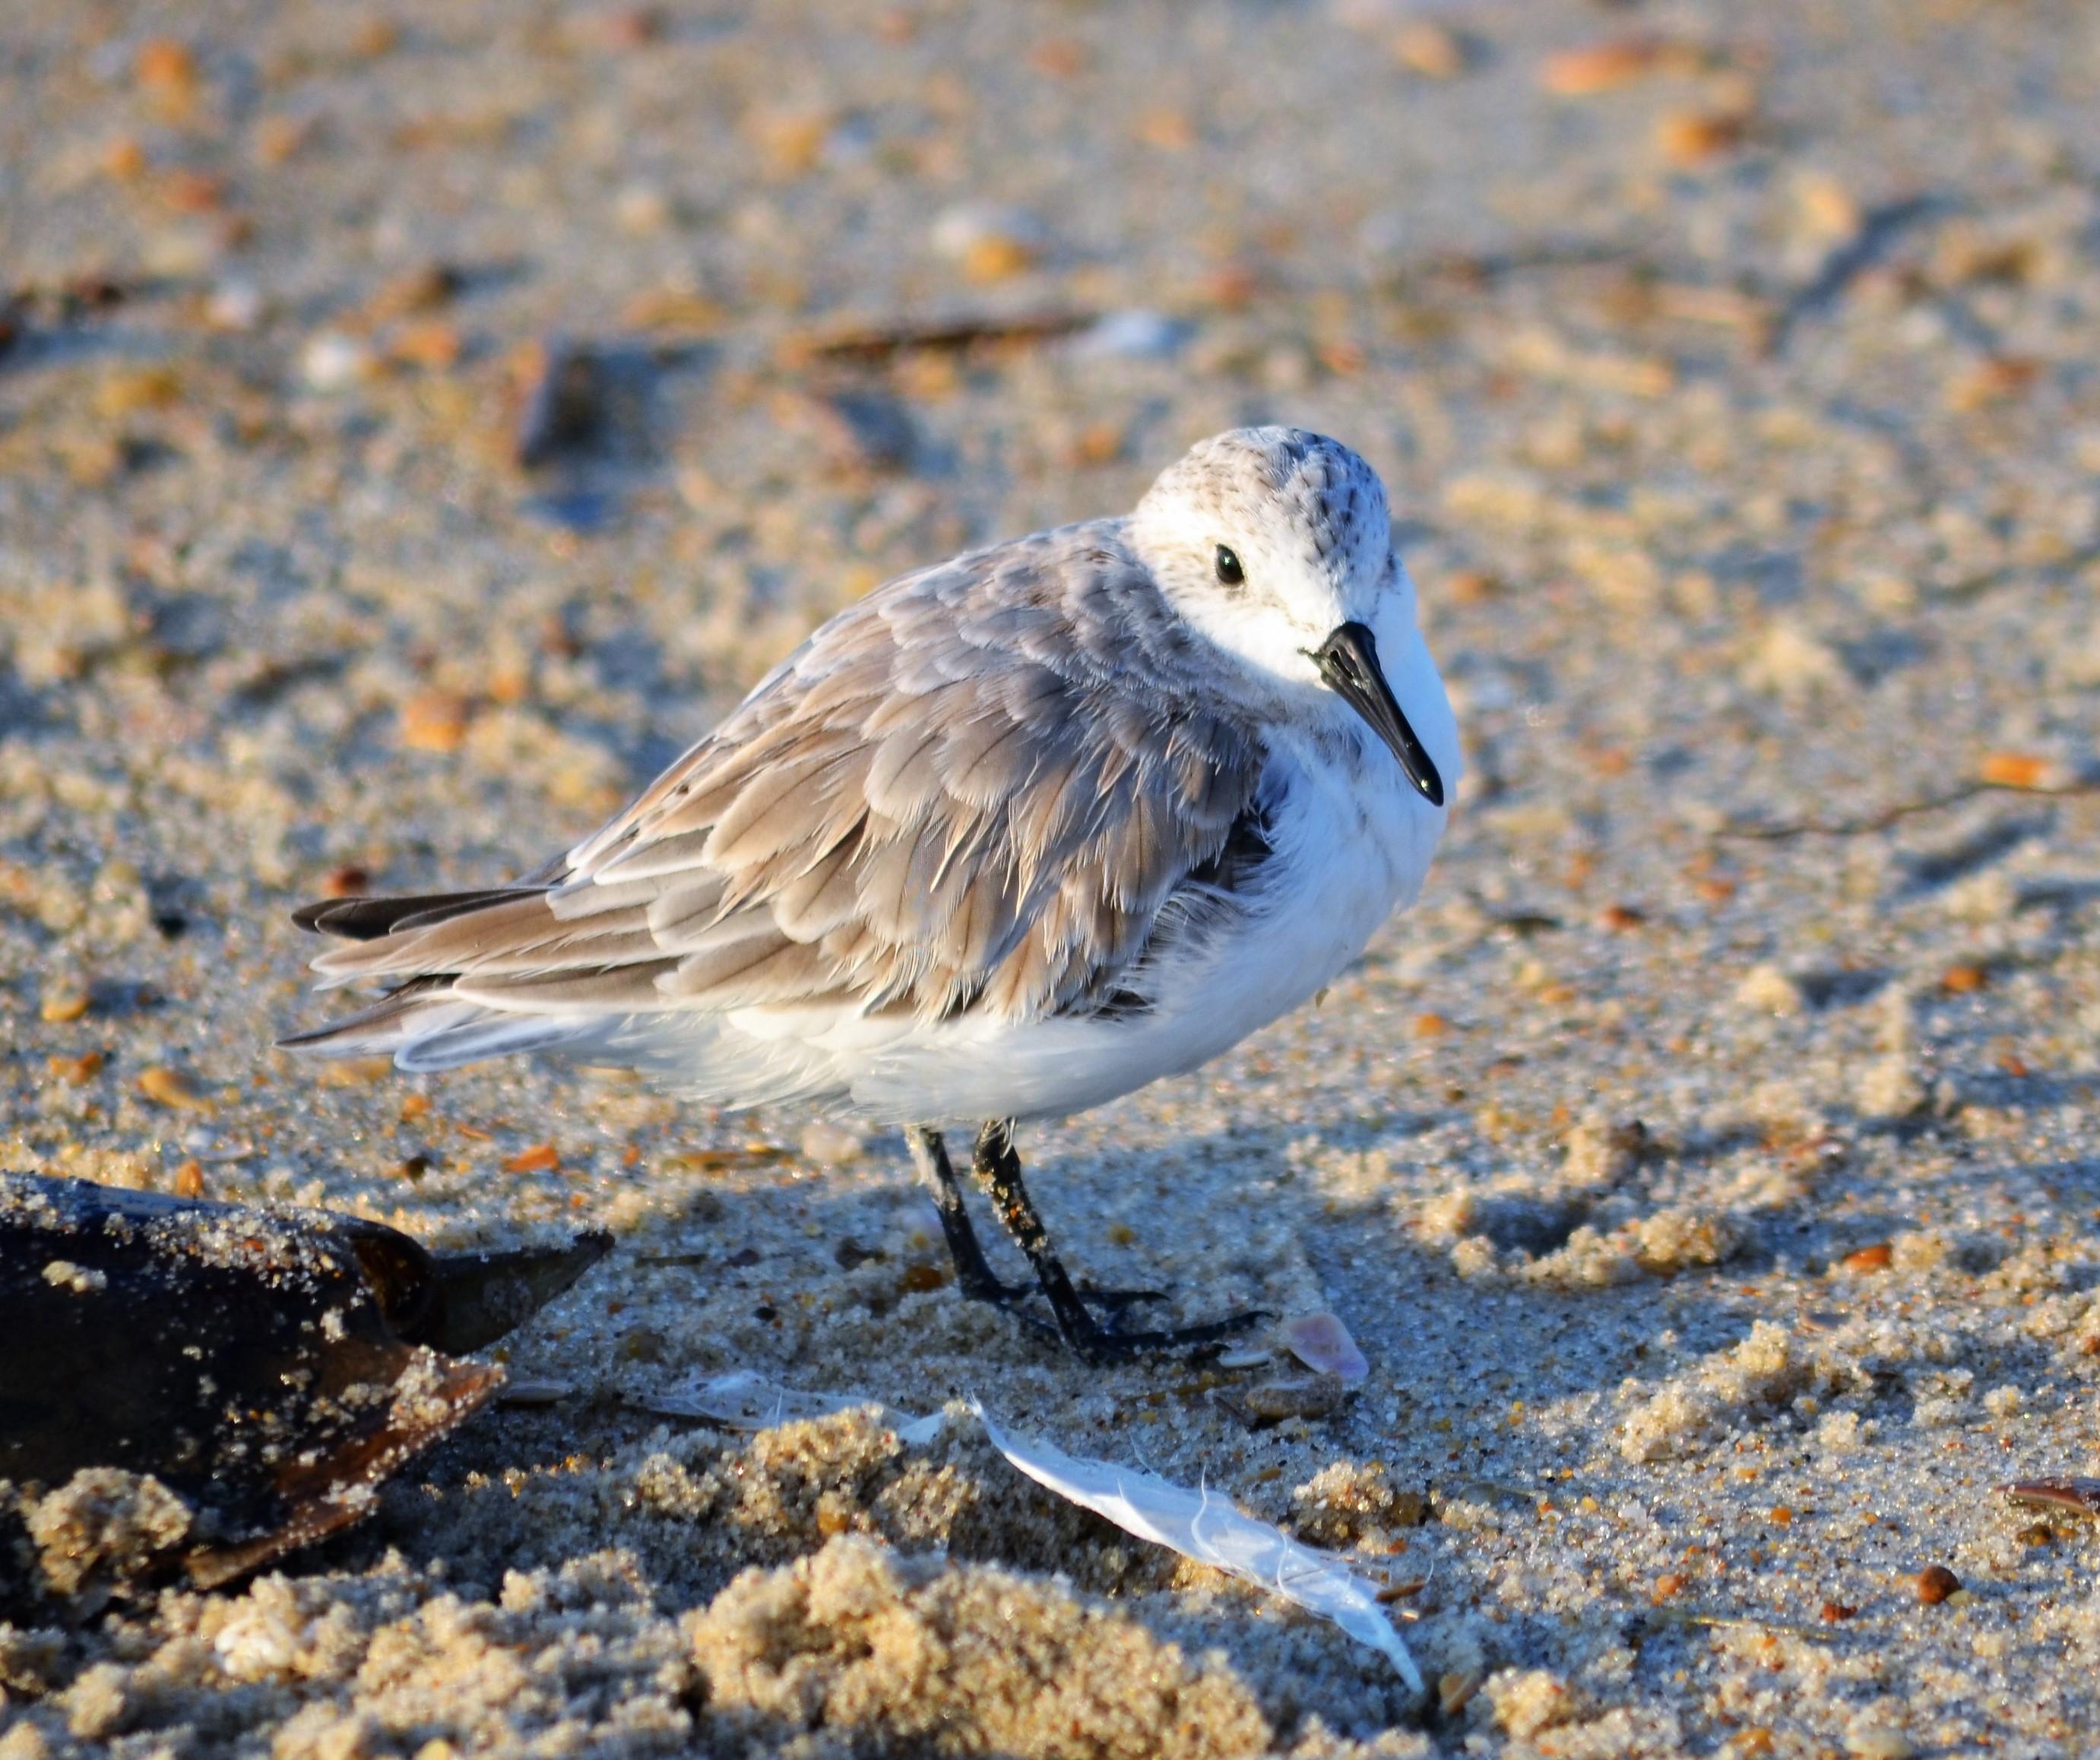 Hatteras Island: Hatteras Kayaking, Sound Access, Crabbing, And Programs